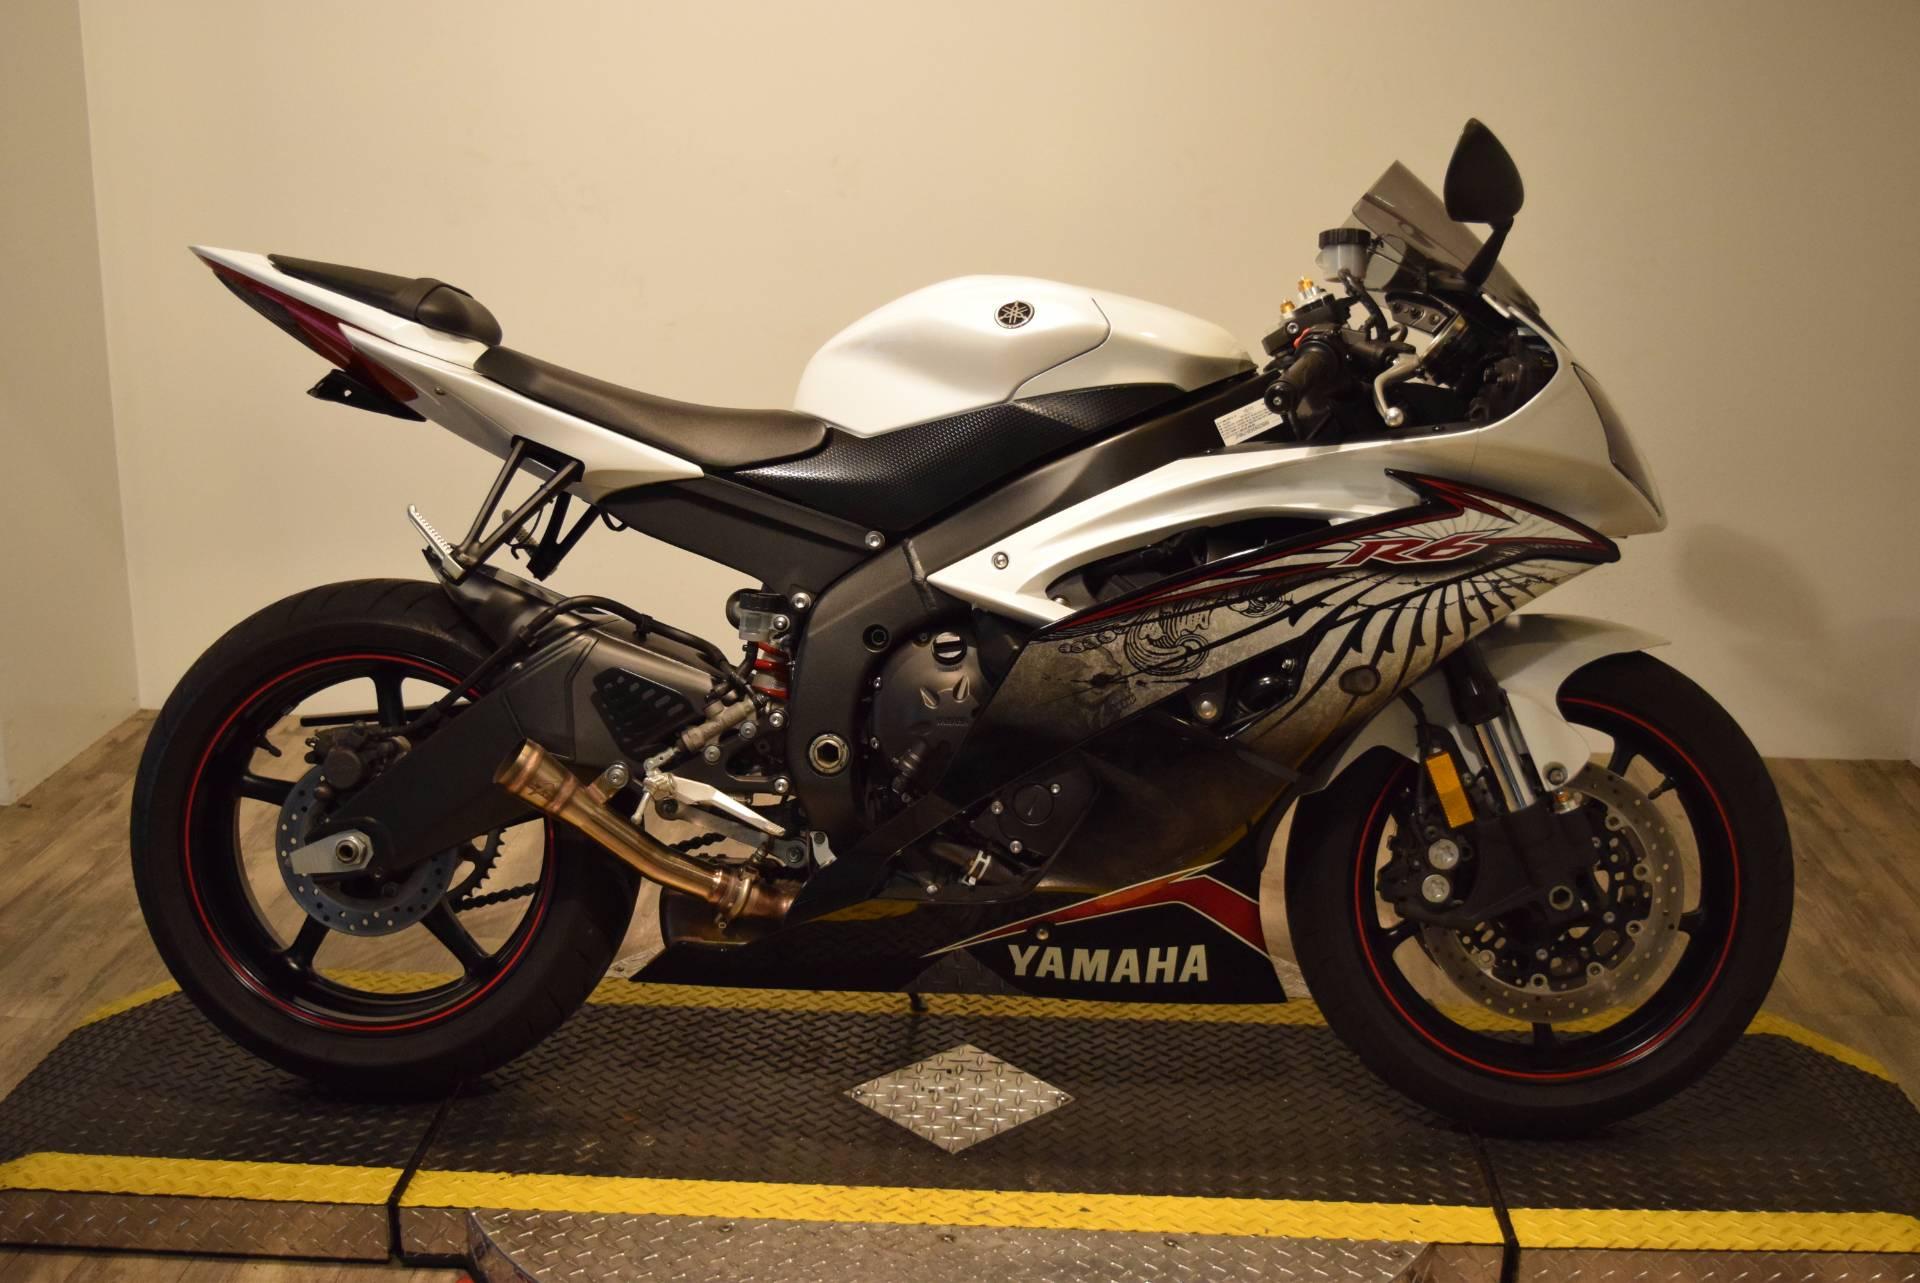 2012 Yamaha YZF-R6 for sale 89711